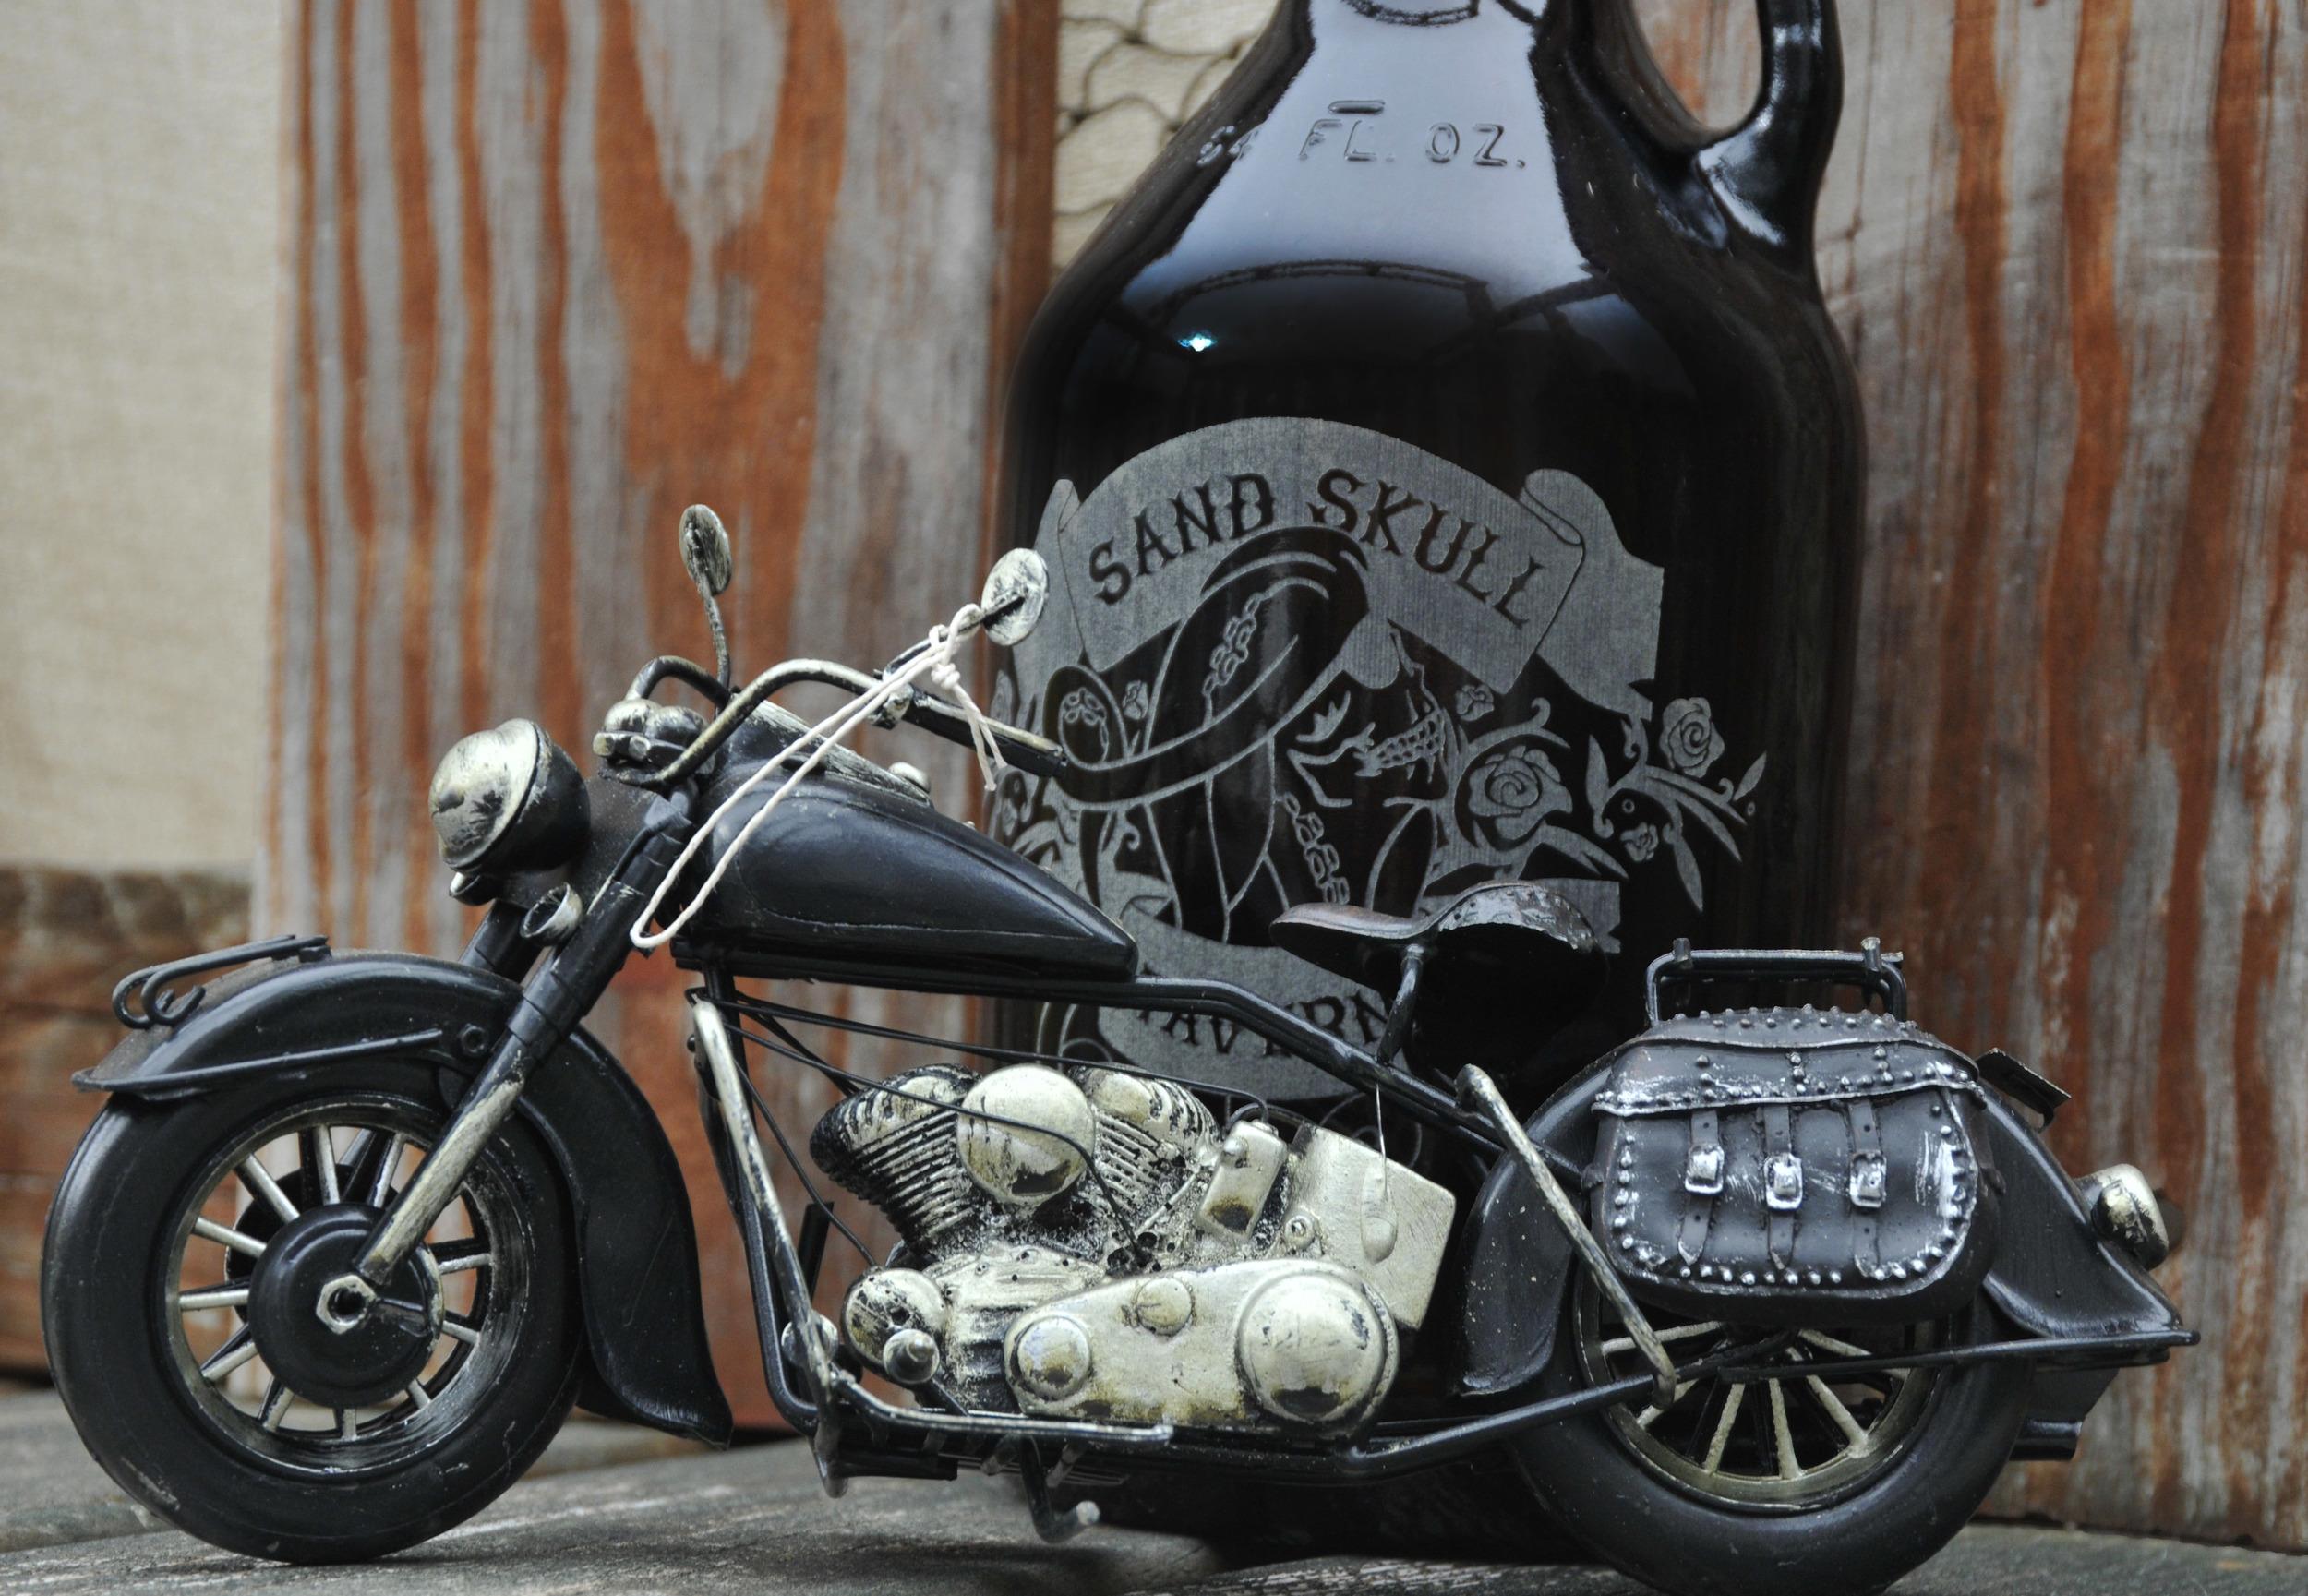 growler and bike.jpg